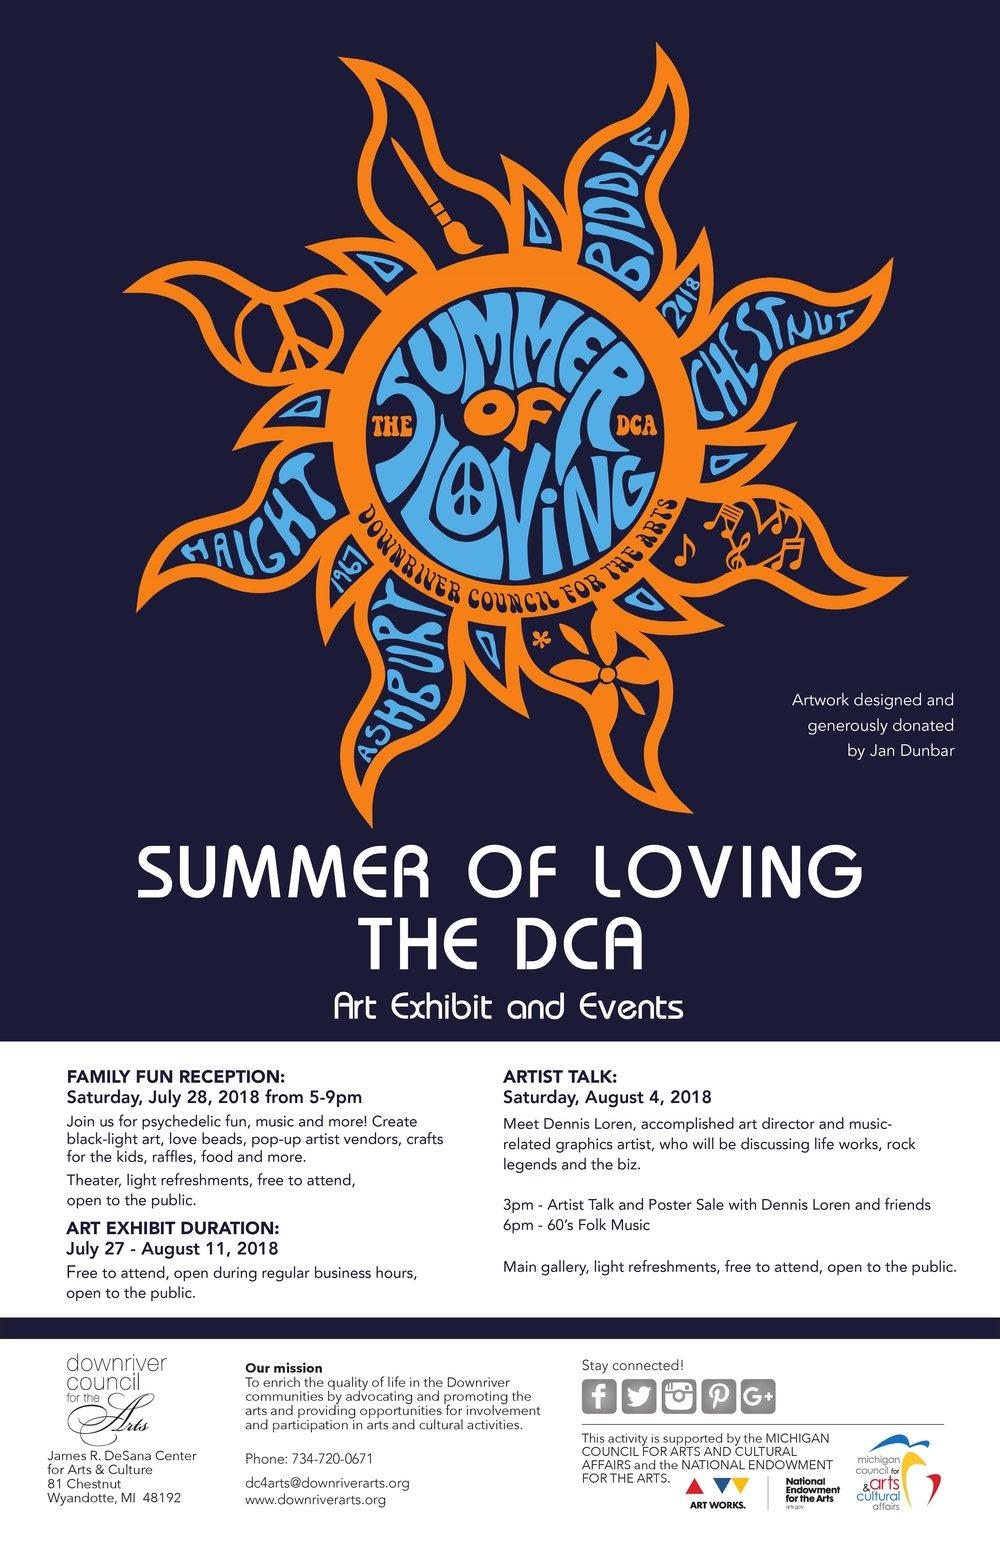 SummerofLoving0718-11x17 exhibit_00001.jpg